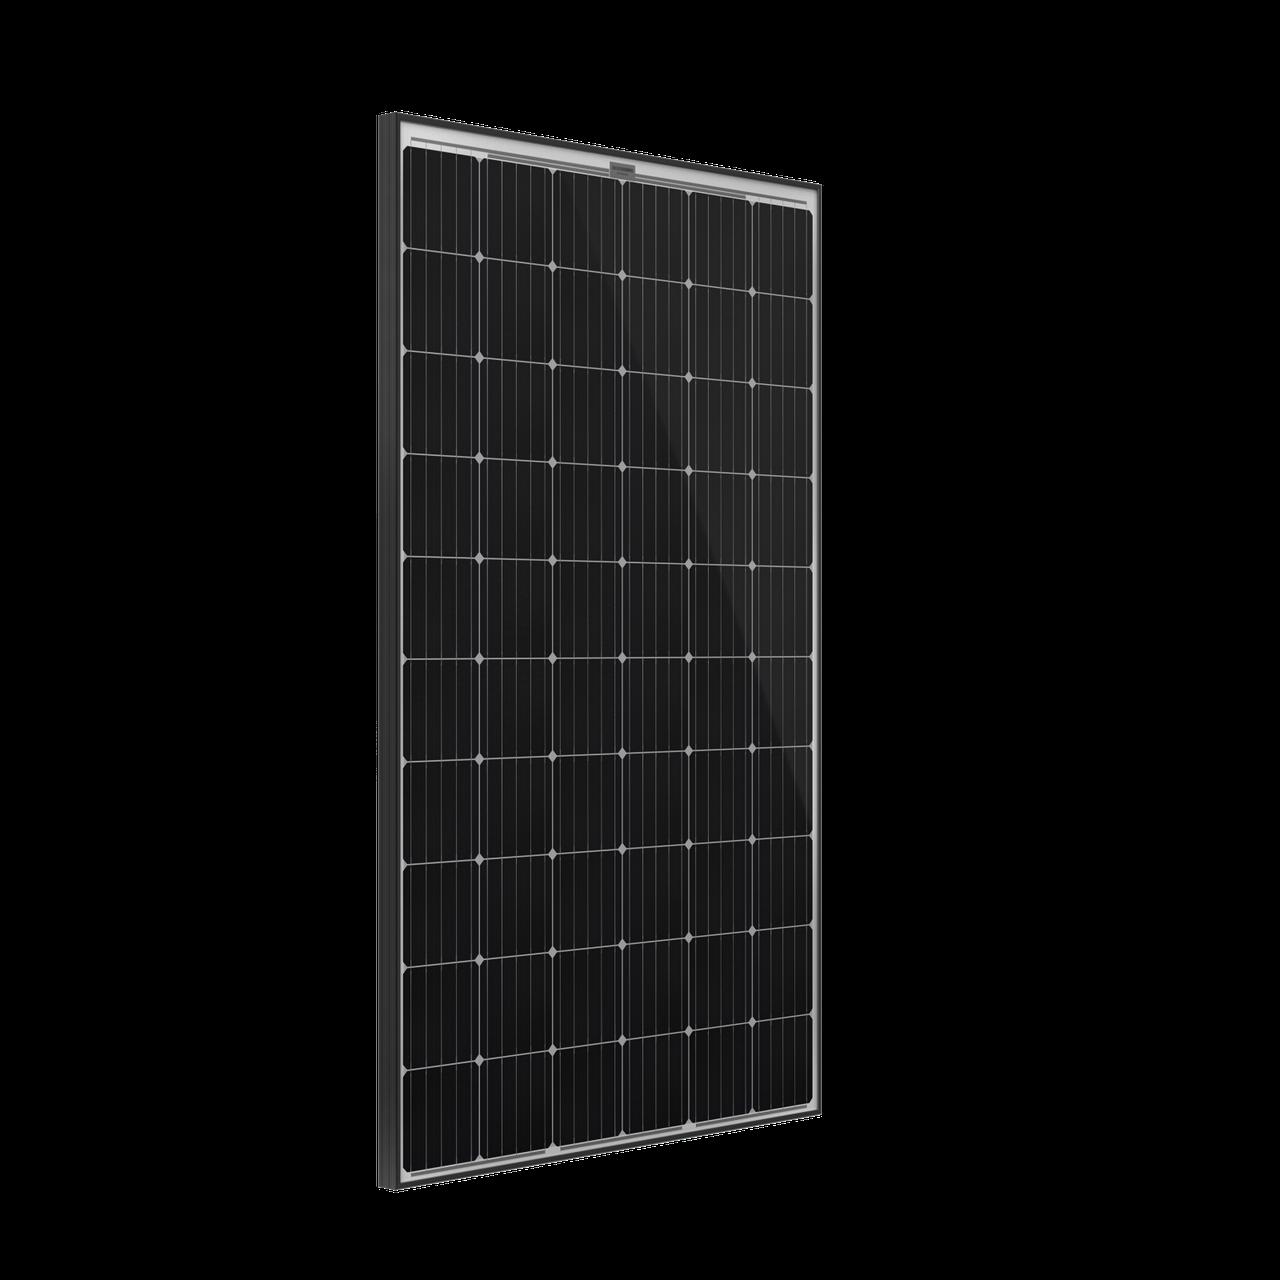 Солнечная батарея Leapton LP60-315M PERC 5BB, 315 Вт (монокристалл)